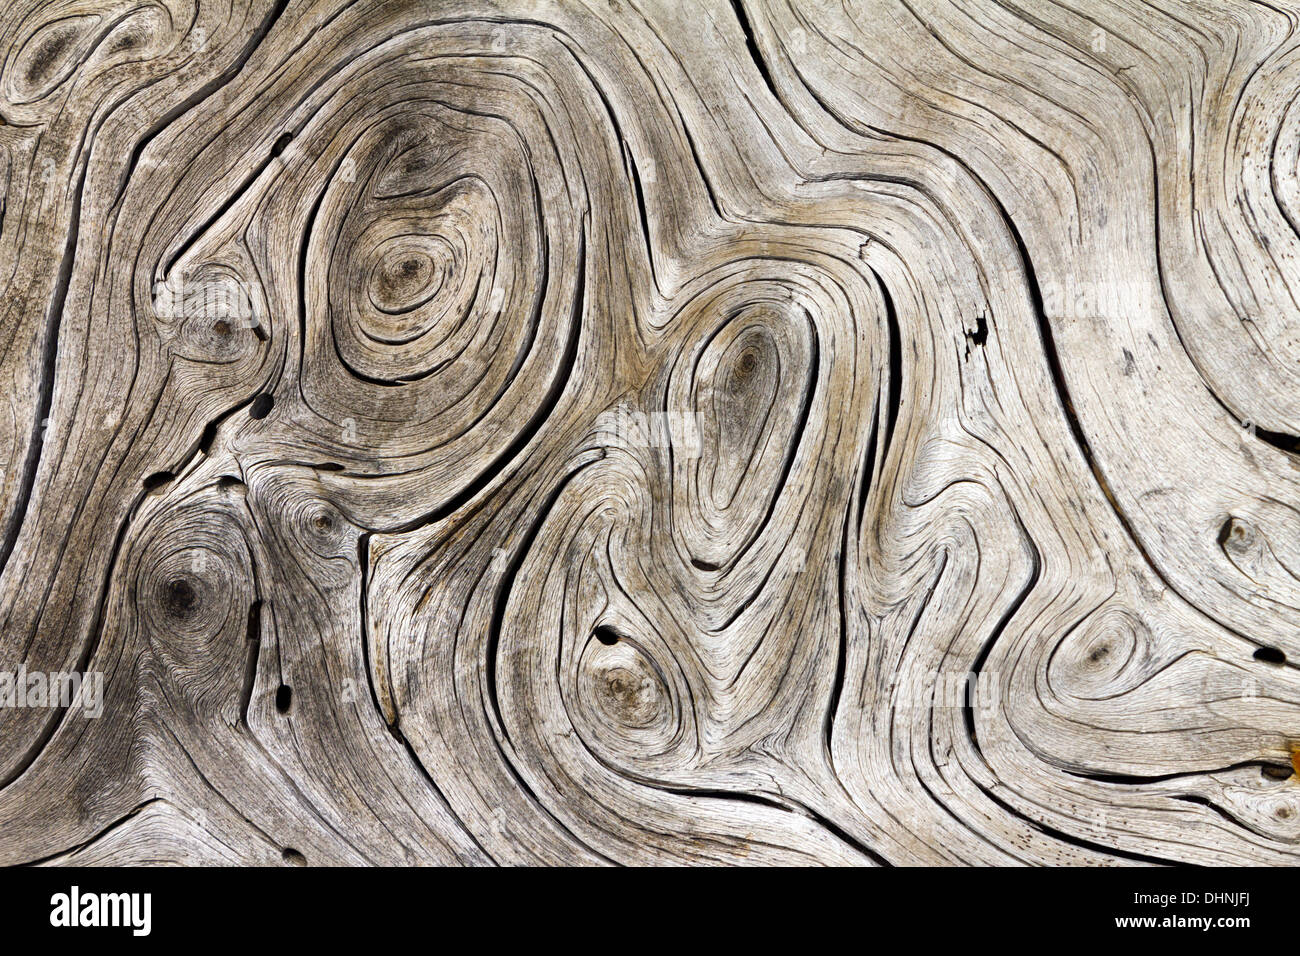 Wooden Swirls Organic Background Texture - Stock Image